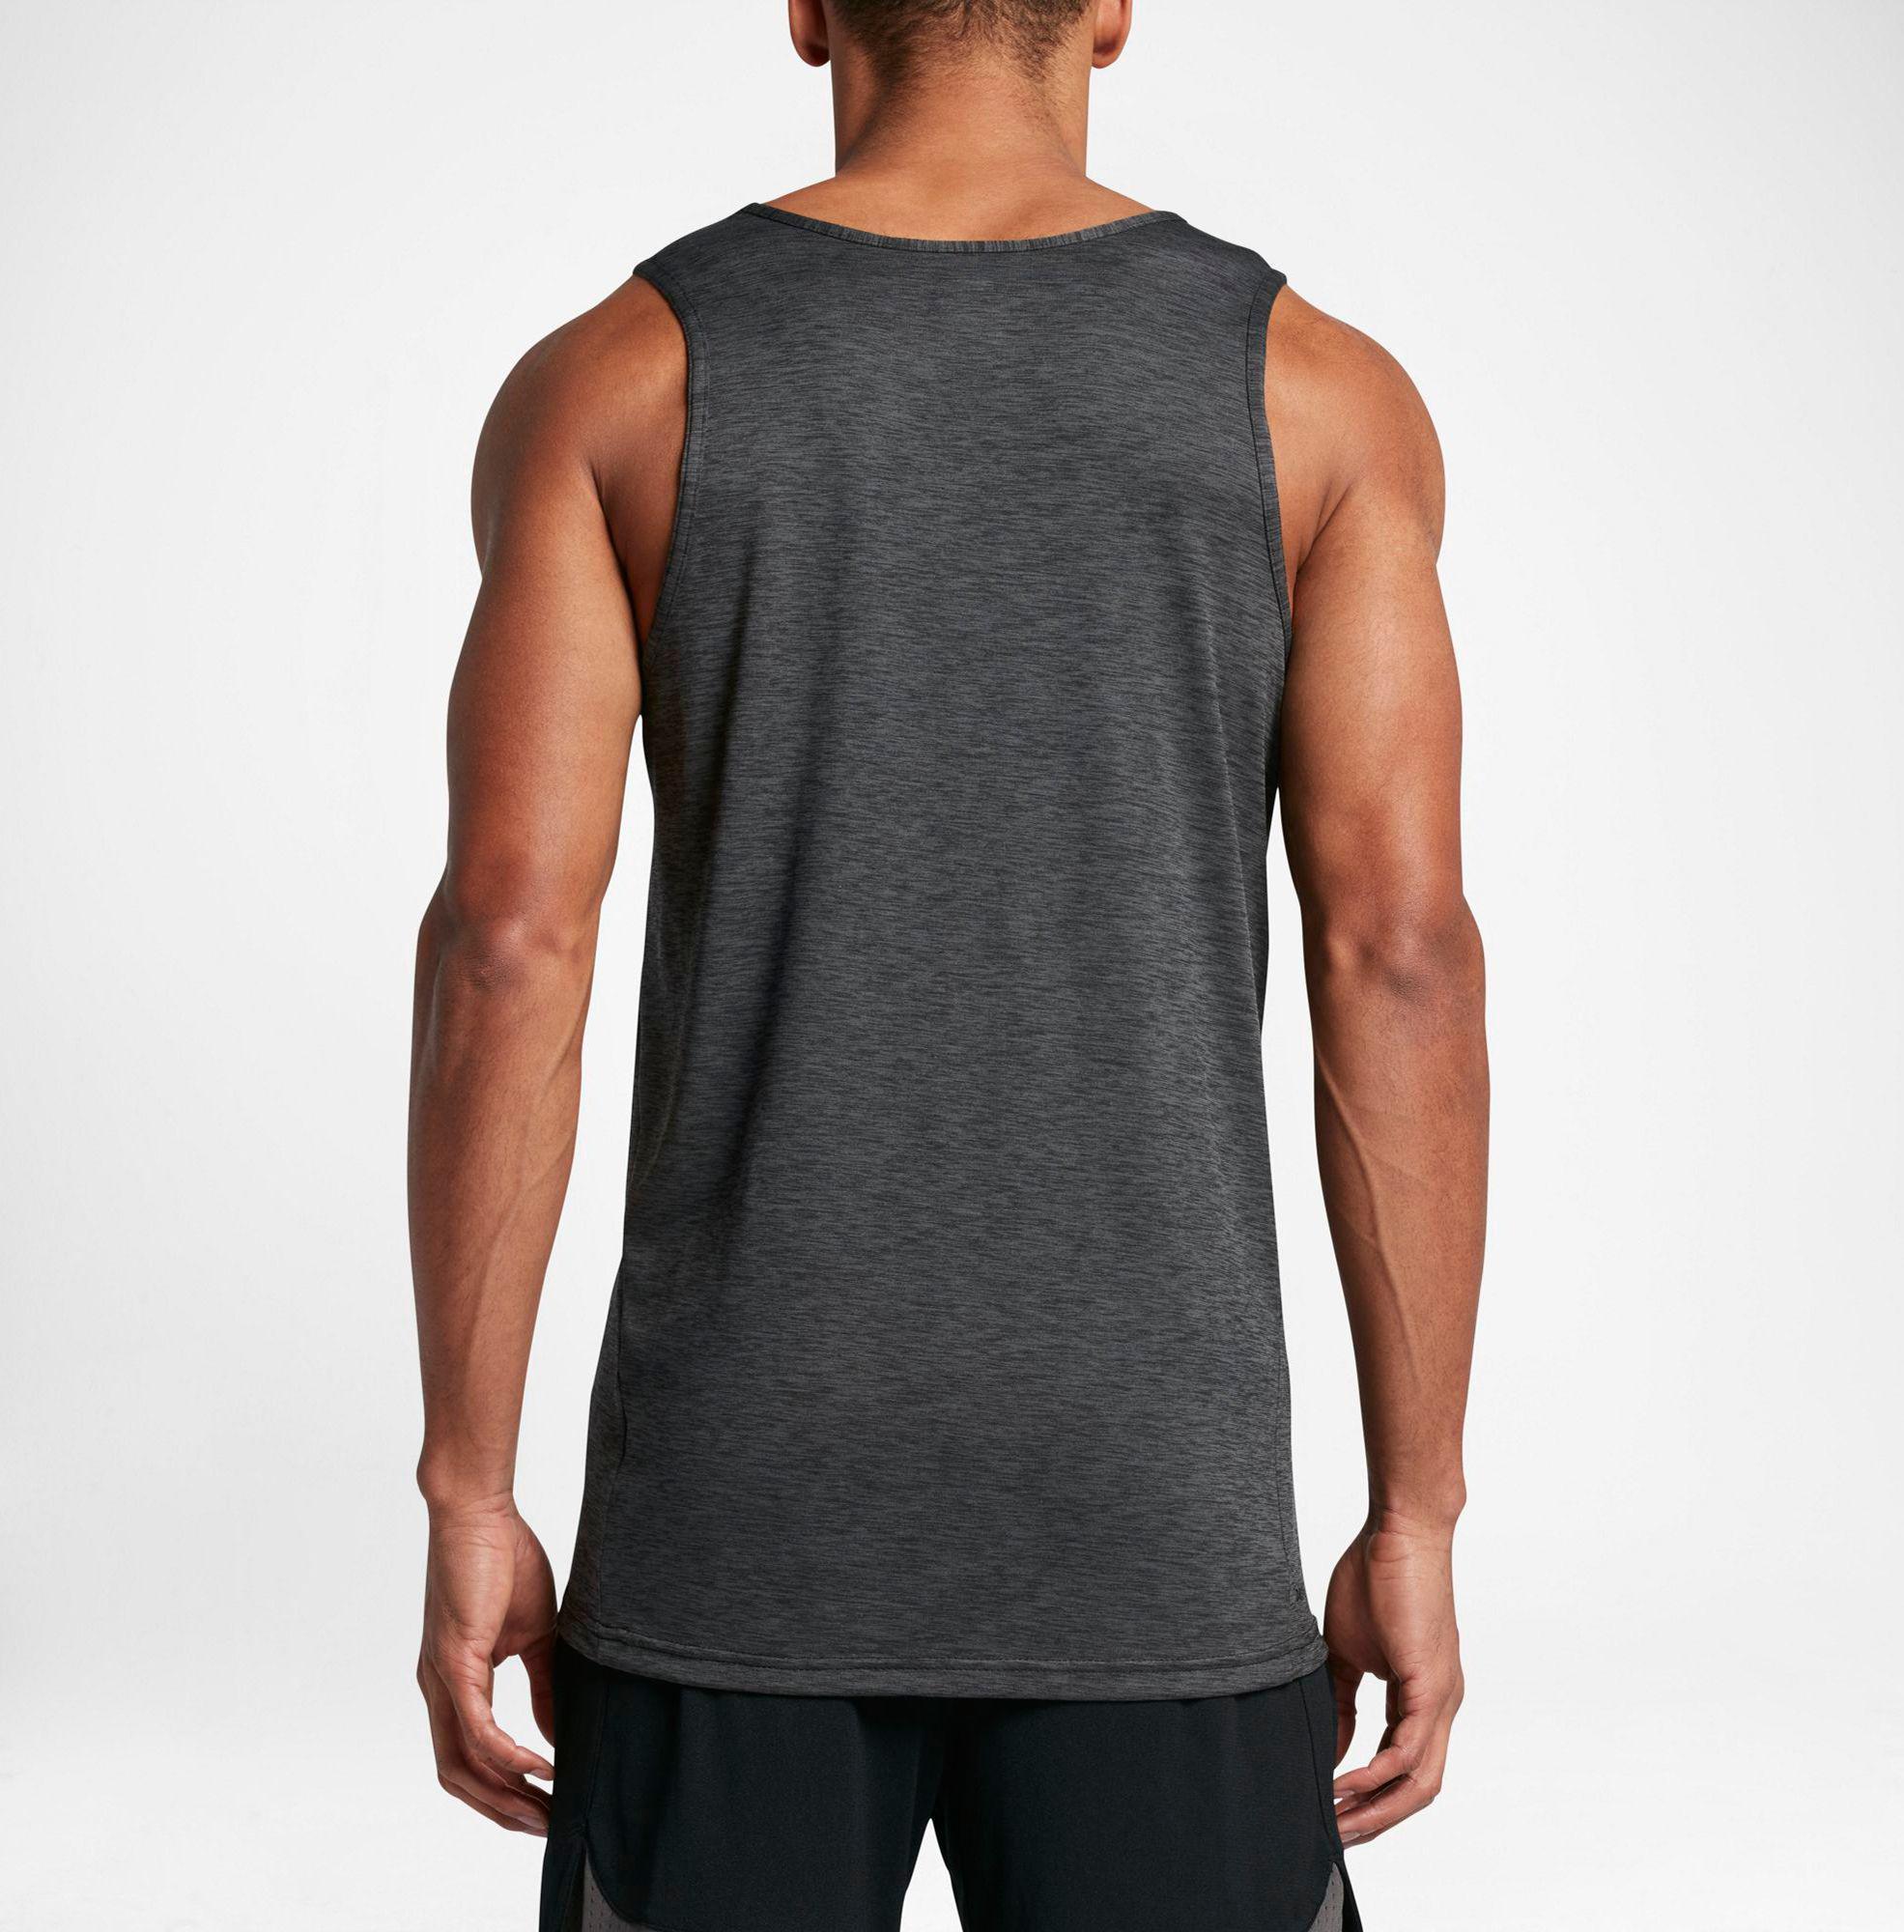 d3b500058aef1 Lyst - Nike Hyper Dry Breathe Tank Top in Black for Men